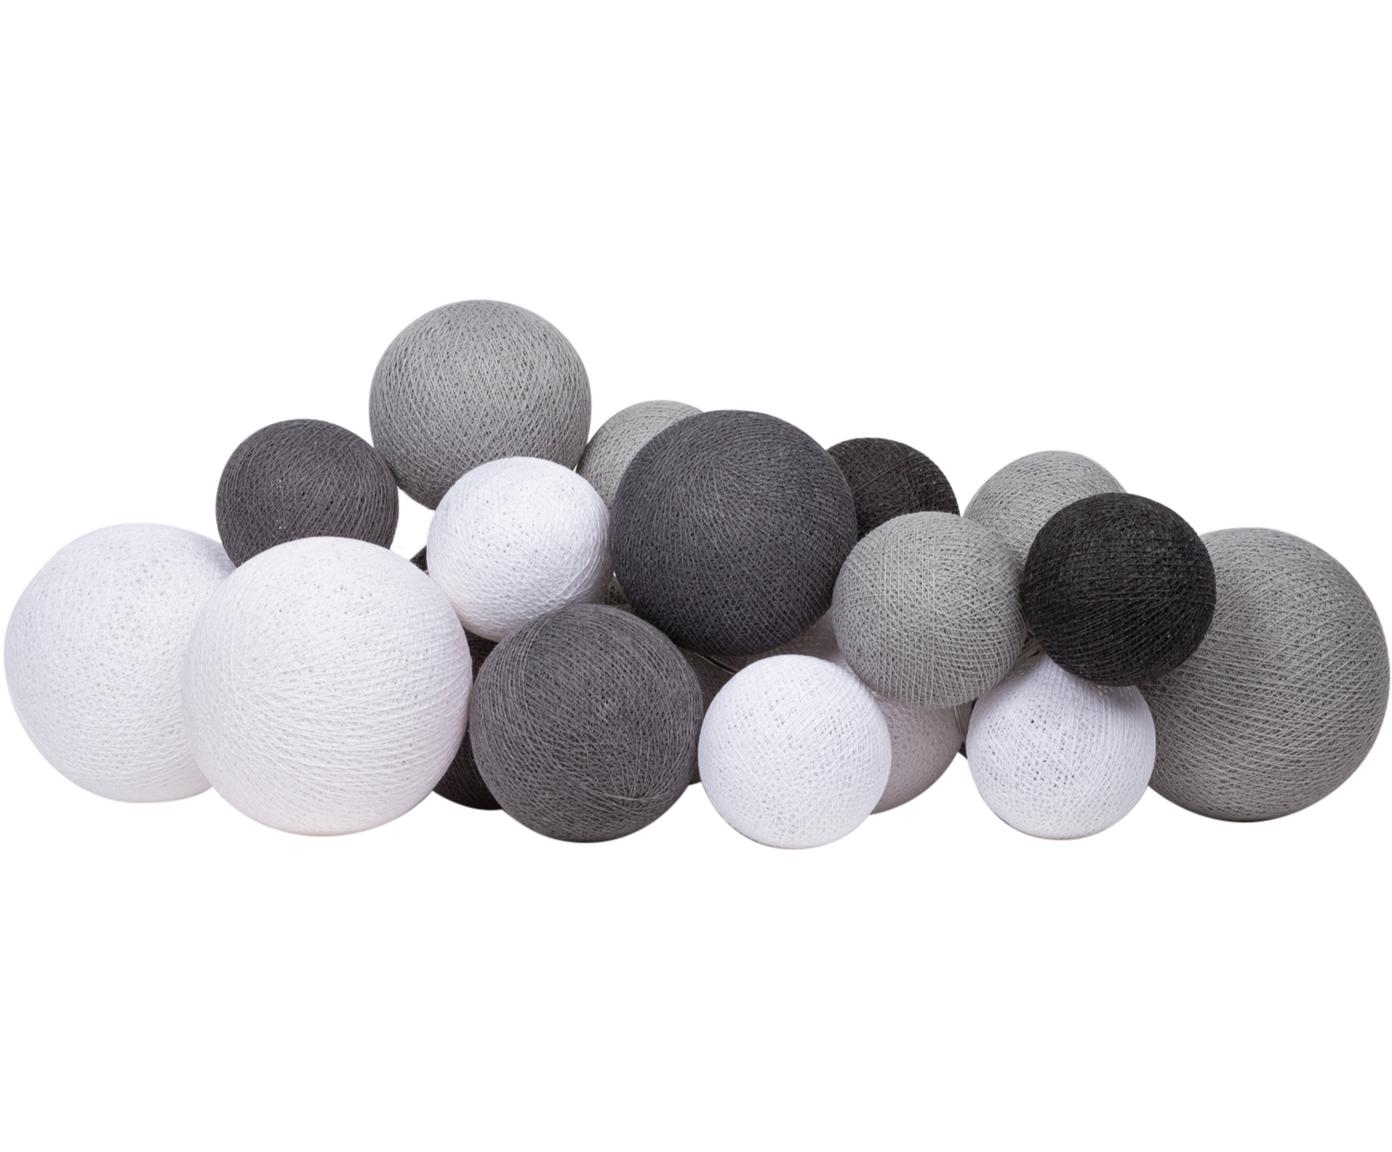 Ghirlanda  a LED Moodi, Tonalità grigie, bianco, Lung. 264 cm